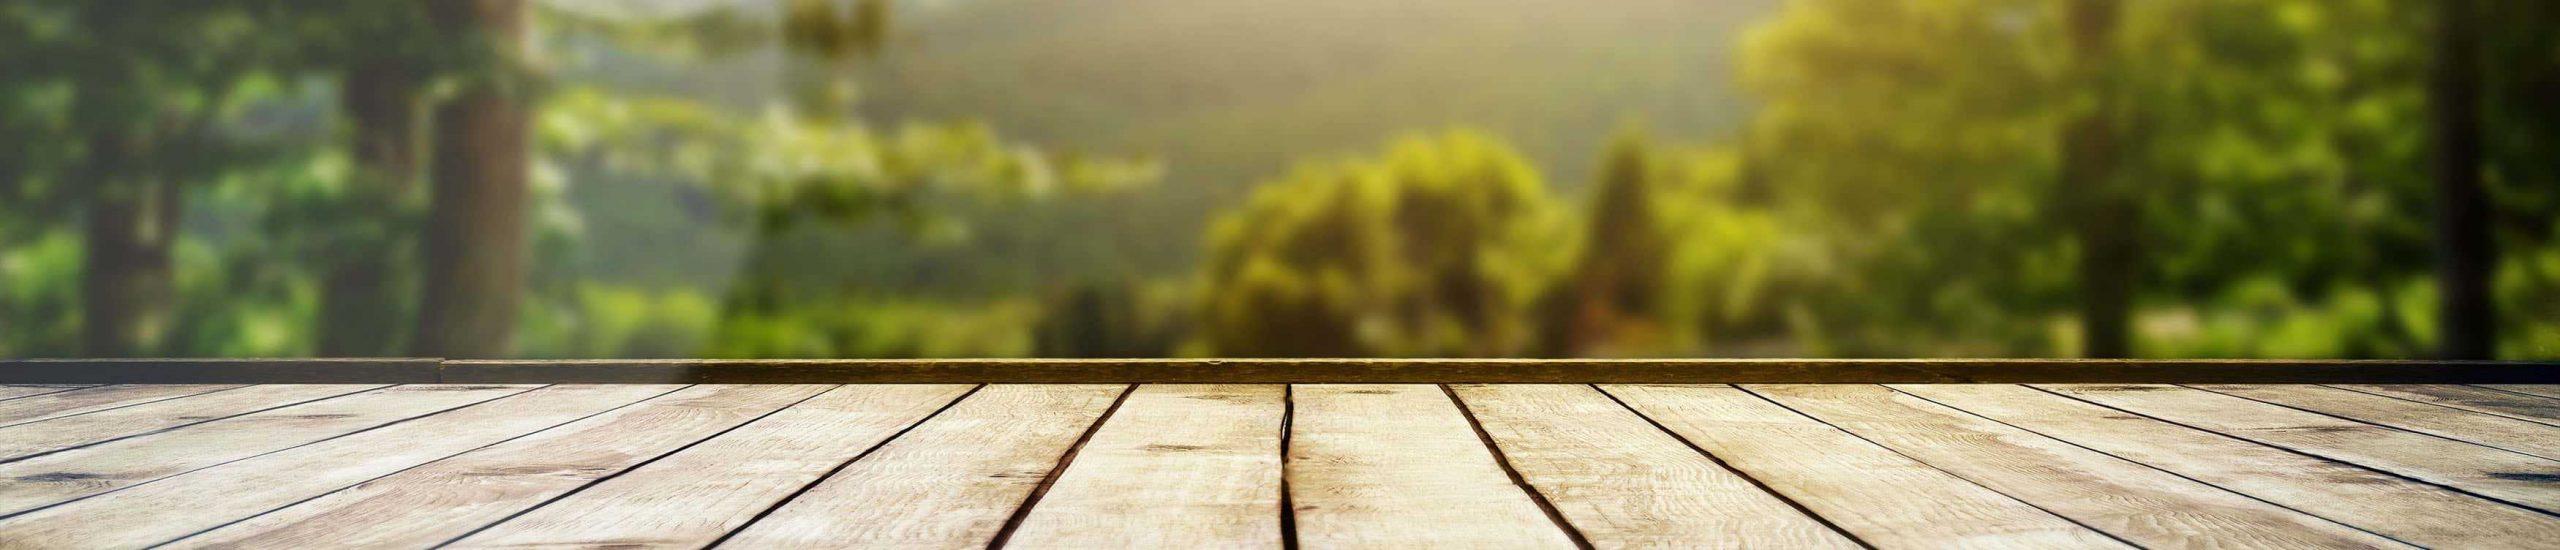 deck background image